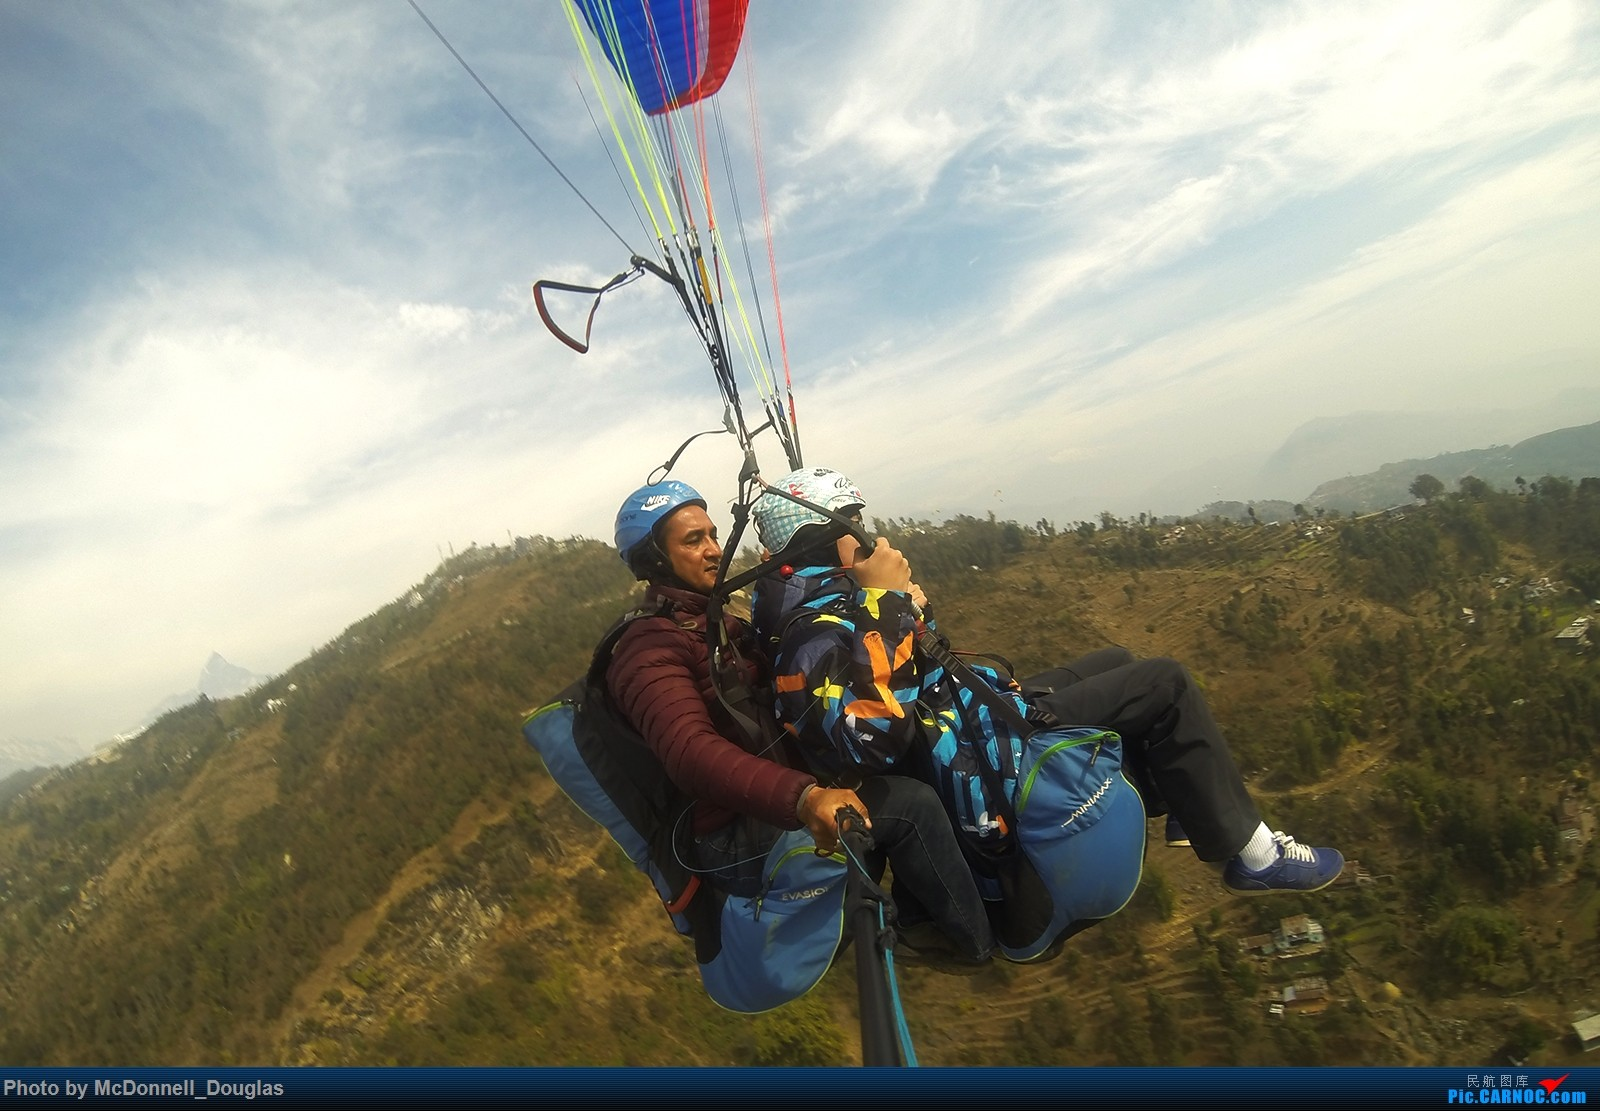 Re:[原创]【上海飞友会】【zc带你游天下(4)】不远千里飞跃喜马拉雅去看你,探寻高山另一边的神秘国度,和一群贫穷却快乐着的人们 AIRBUS A330-343 B-6119 中国上海虹桥国际机场